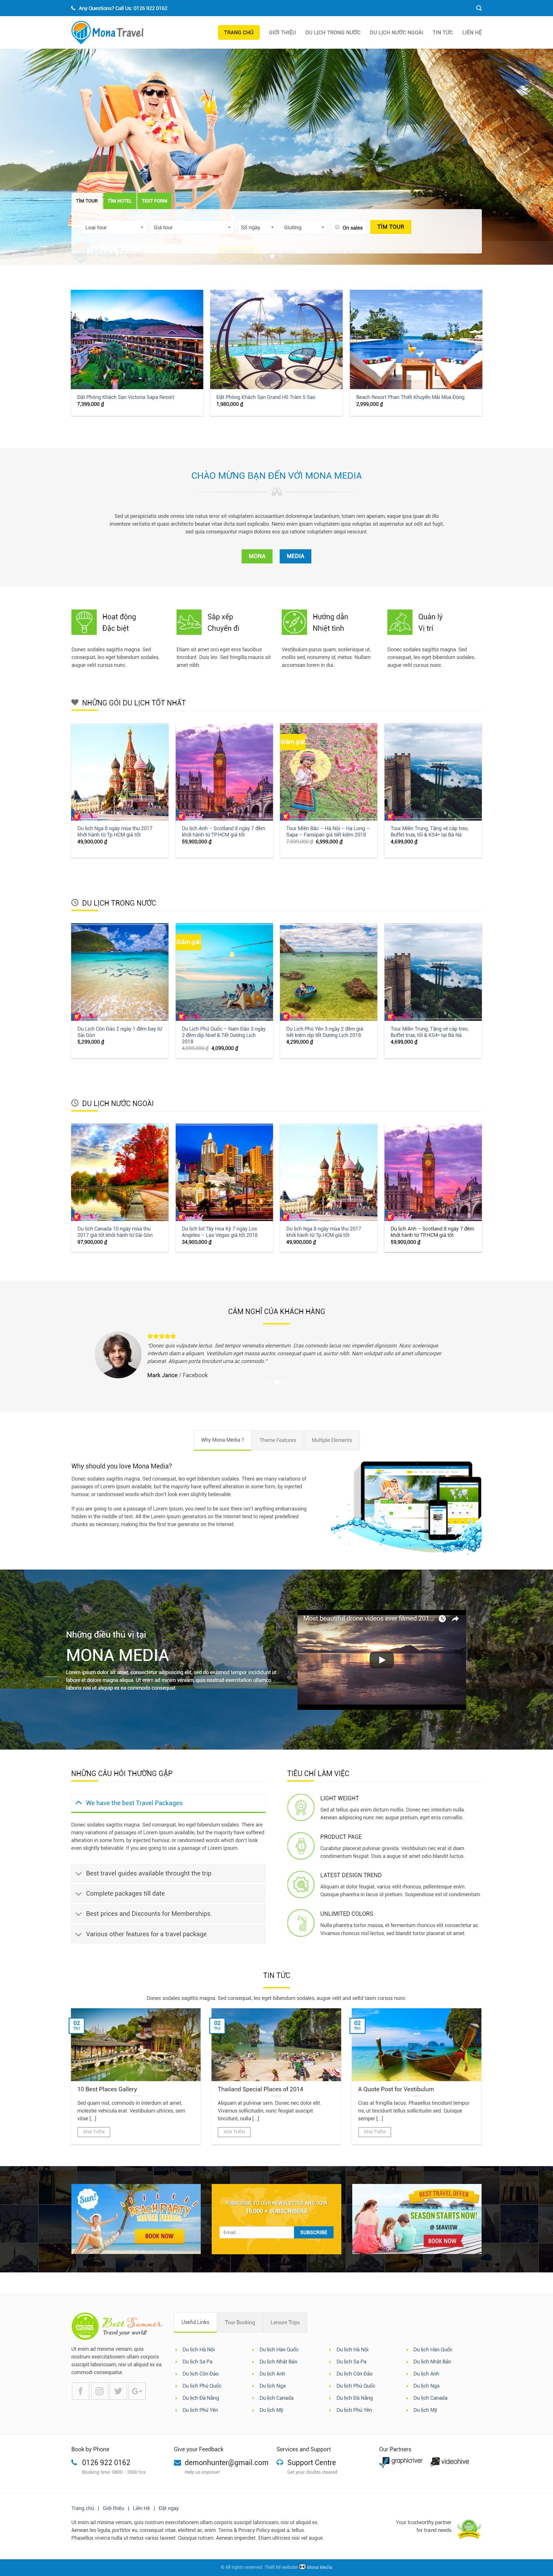 Mẫu website dịch vụ du lịch giống Trendy Travel